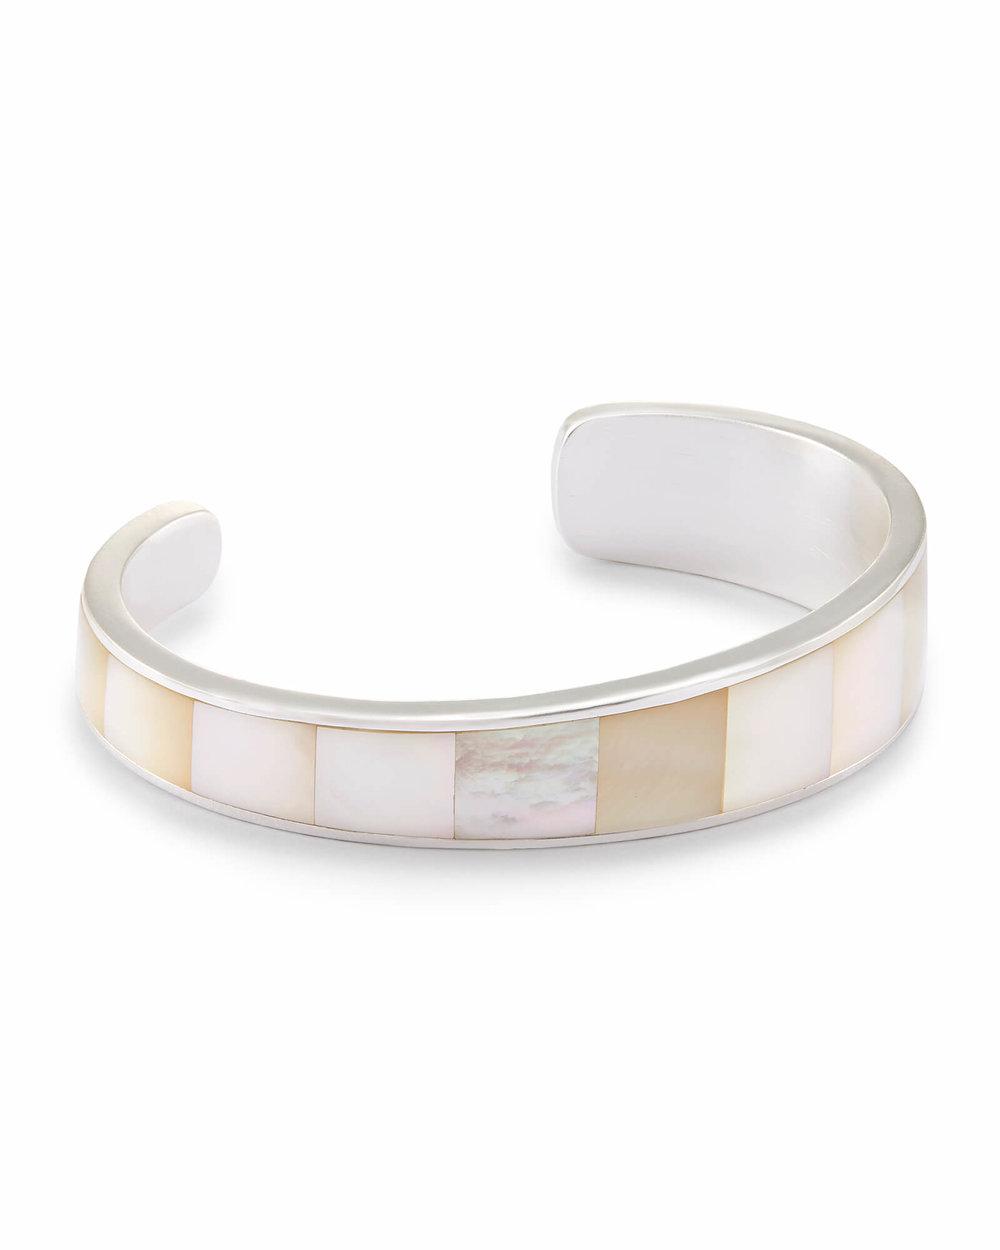 kendra-scott-serena-cuff-bracelet-in-ivory-pearl_00_default_lg.jpg